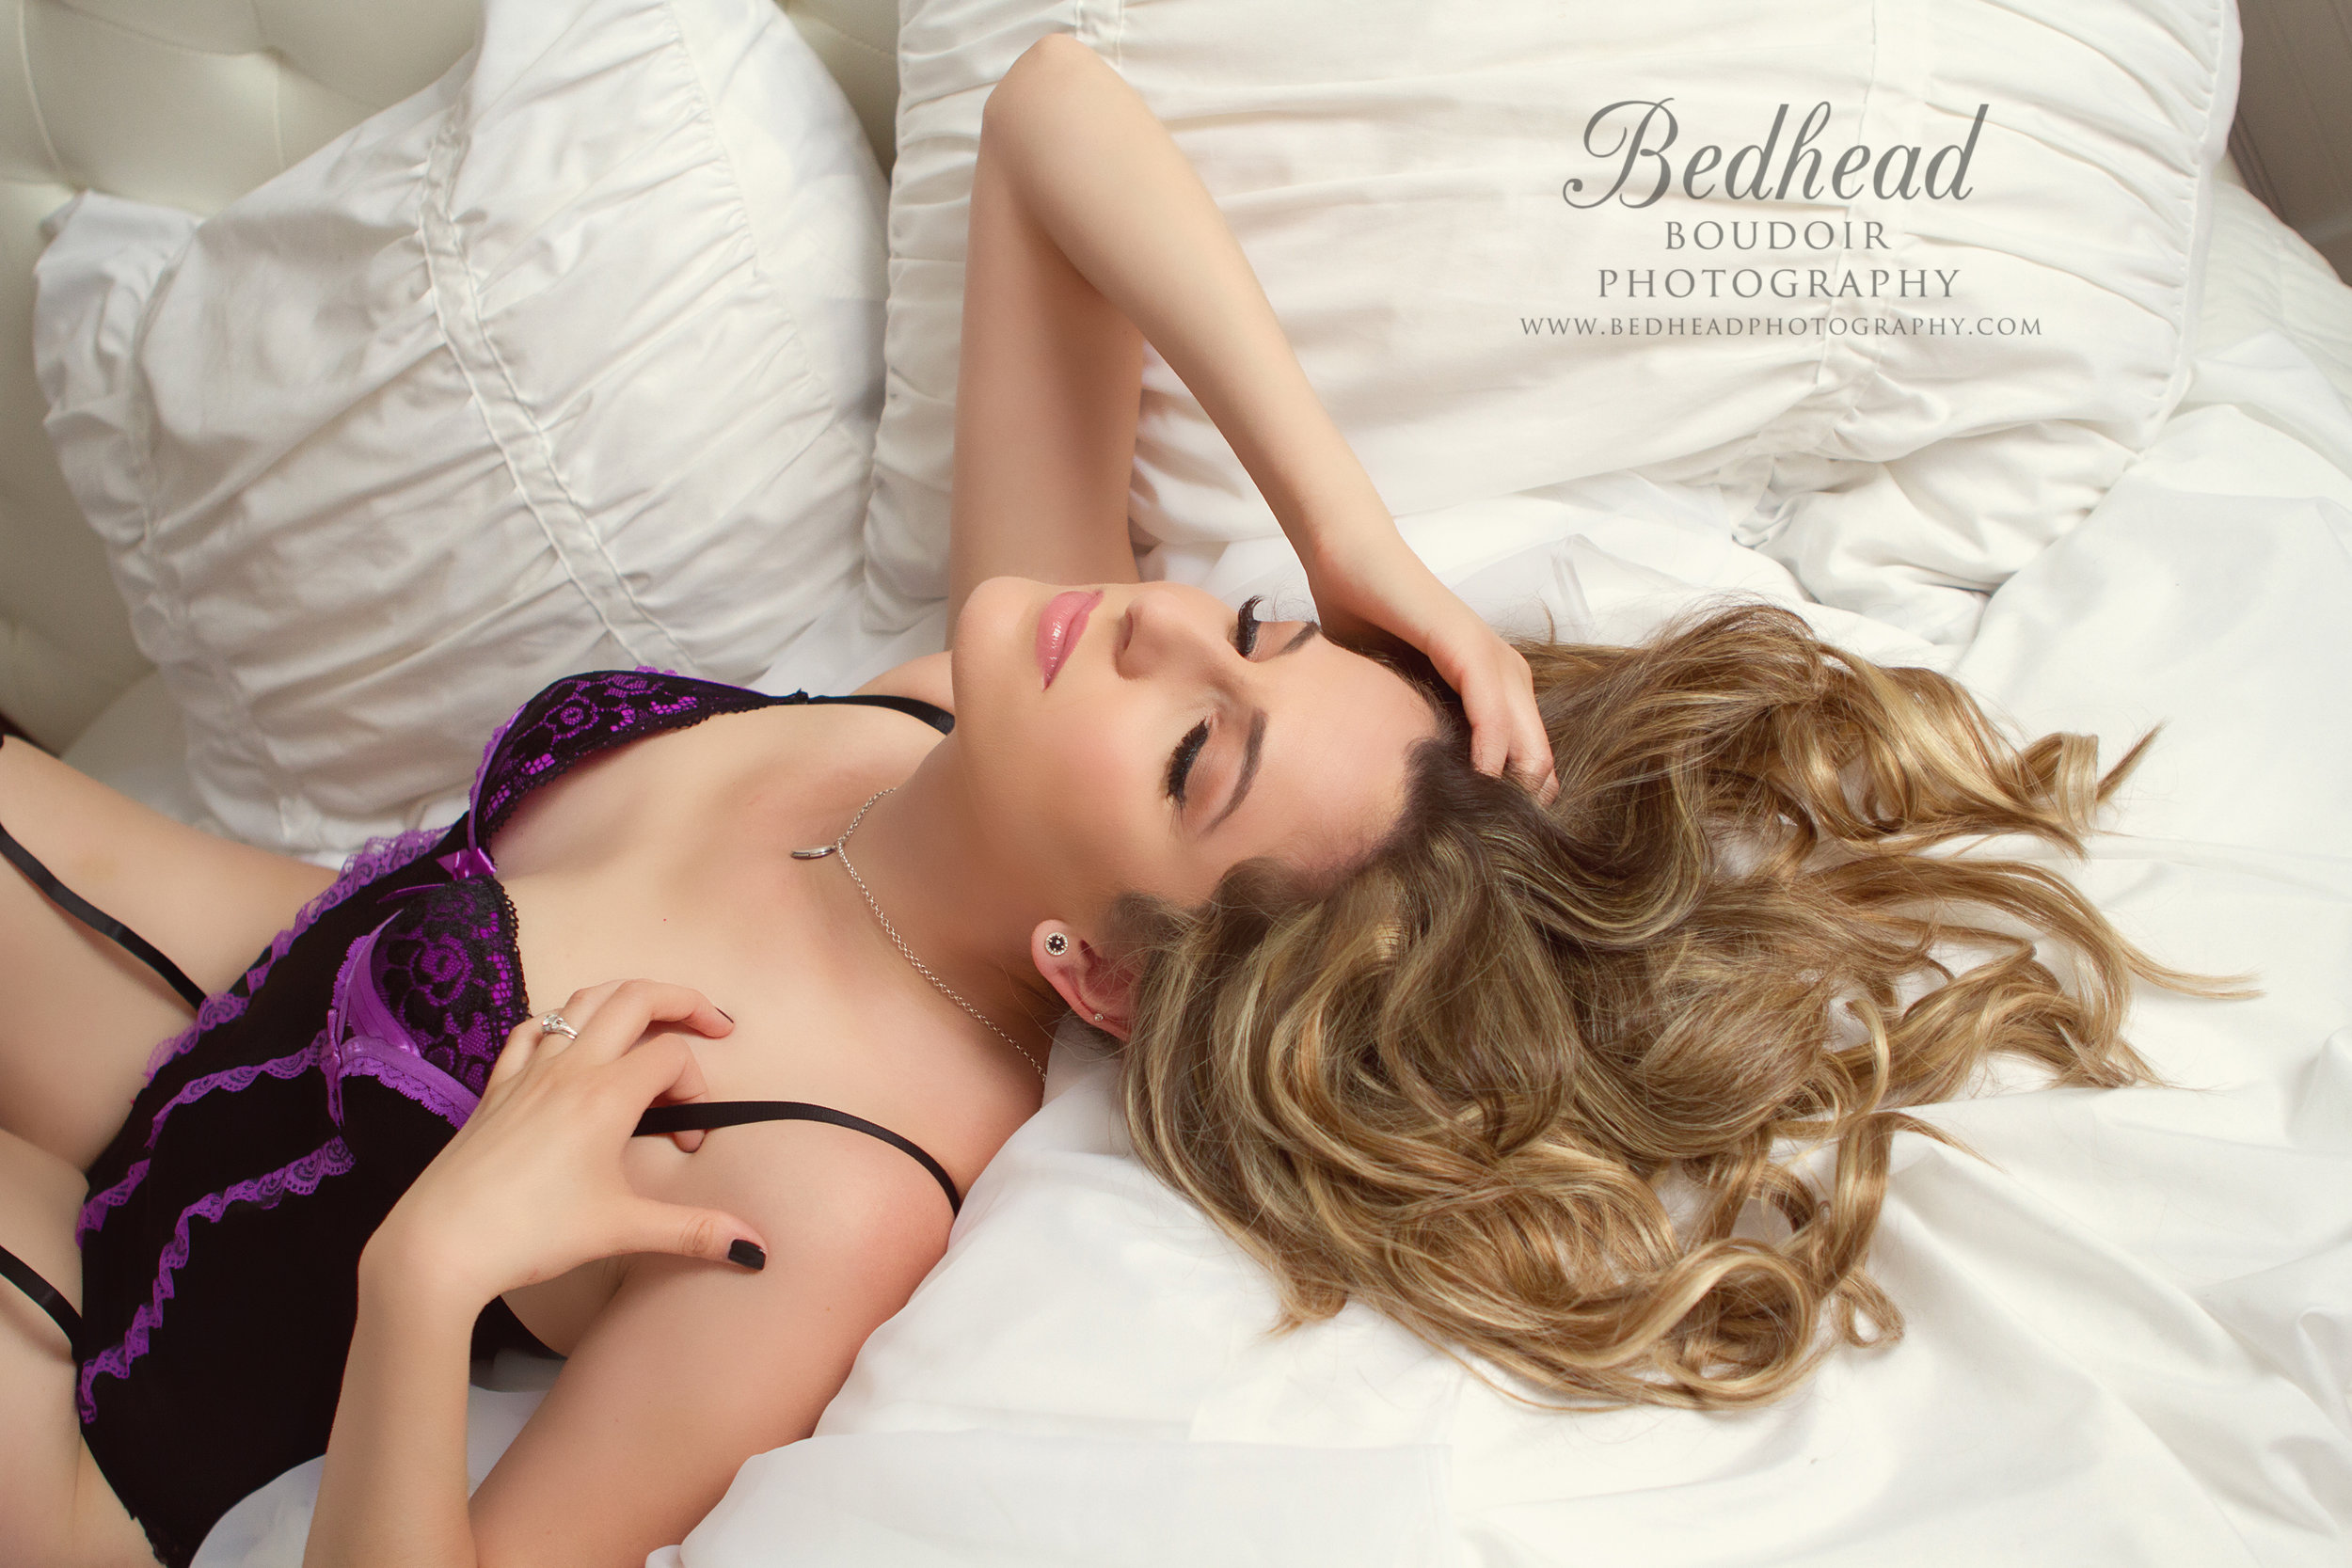 bedhead boudoir photography chicago il